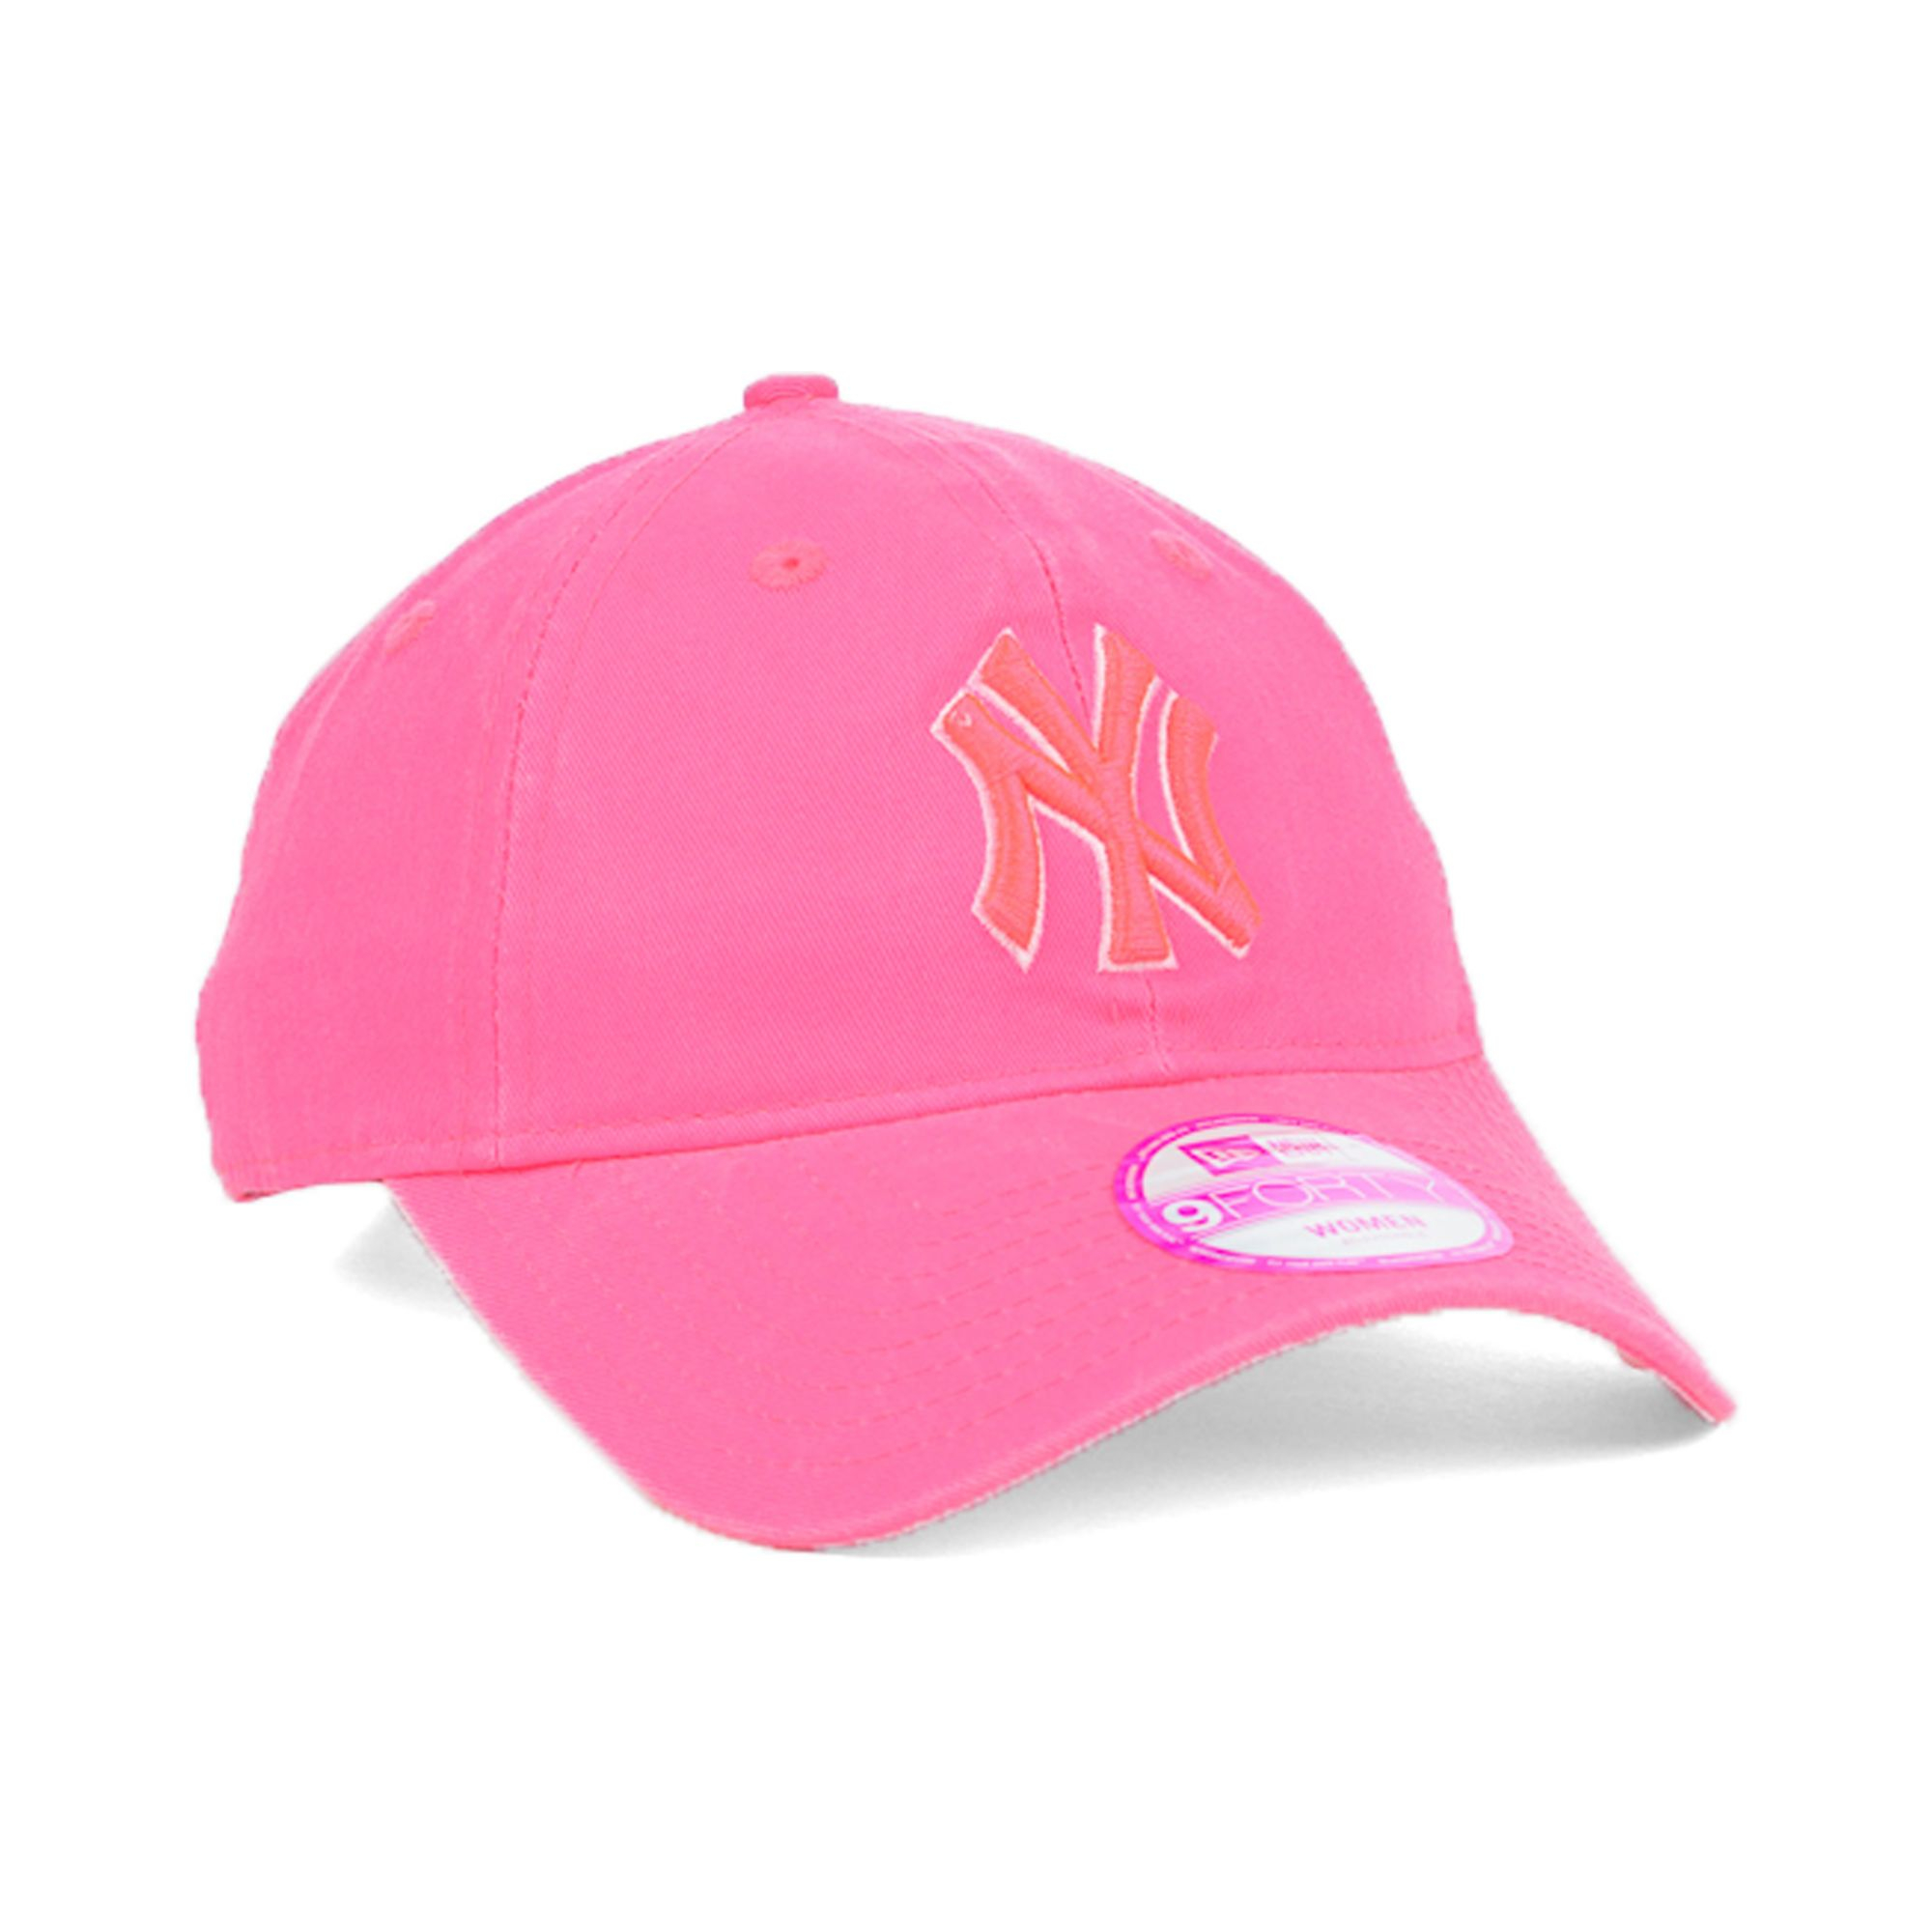 532b2a4a1b99 Lyst - Ktz New York Yankees Fashion Essential 9forty Cap in Pink